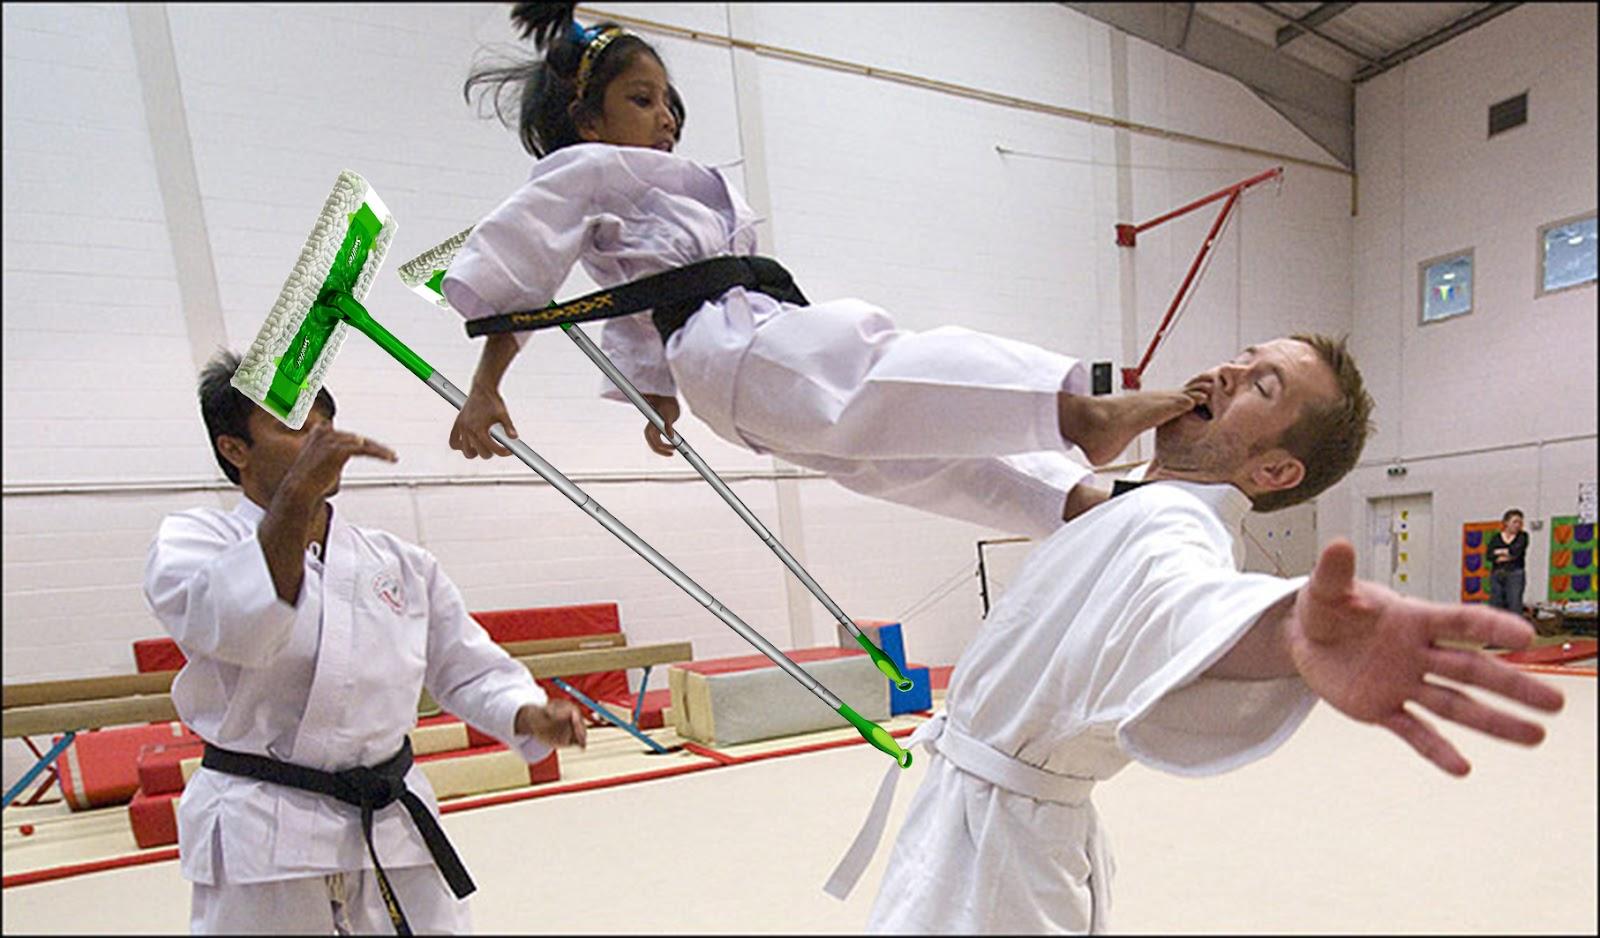 Karate Sweeper.jpg